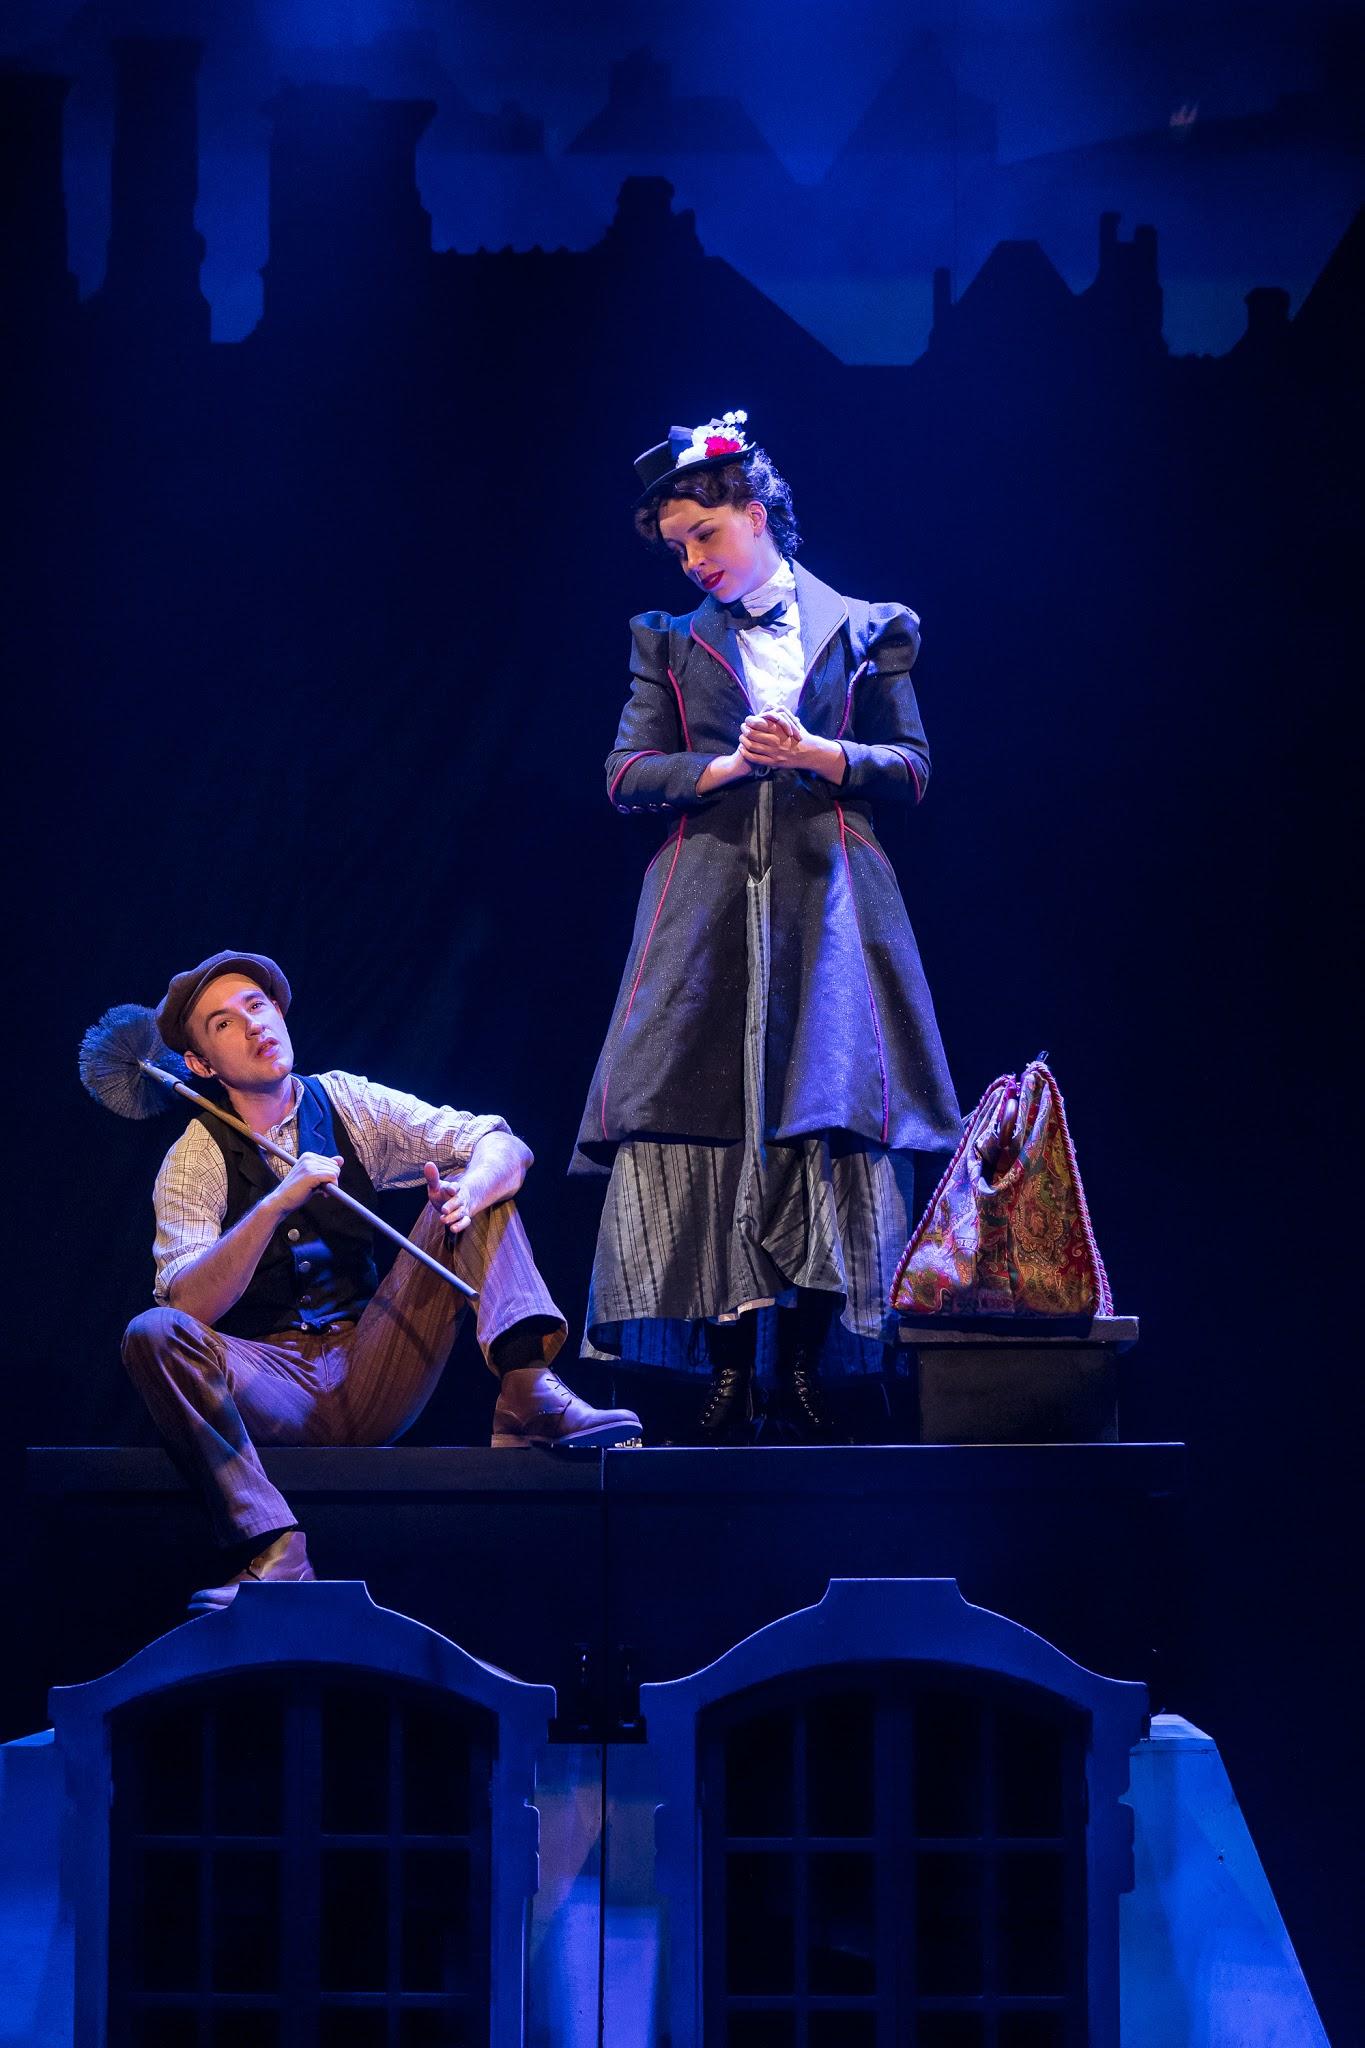 Mercury Theater, Mary Poppins - Matt Crowle (Bert), Nicole Armold (Mary Poppins) - Brett A. Beiner.jpg